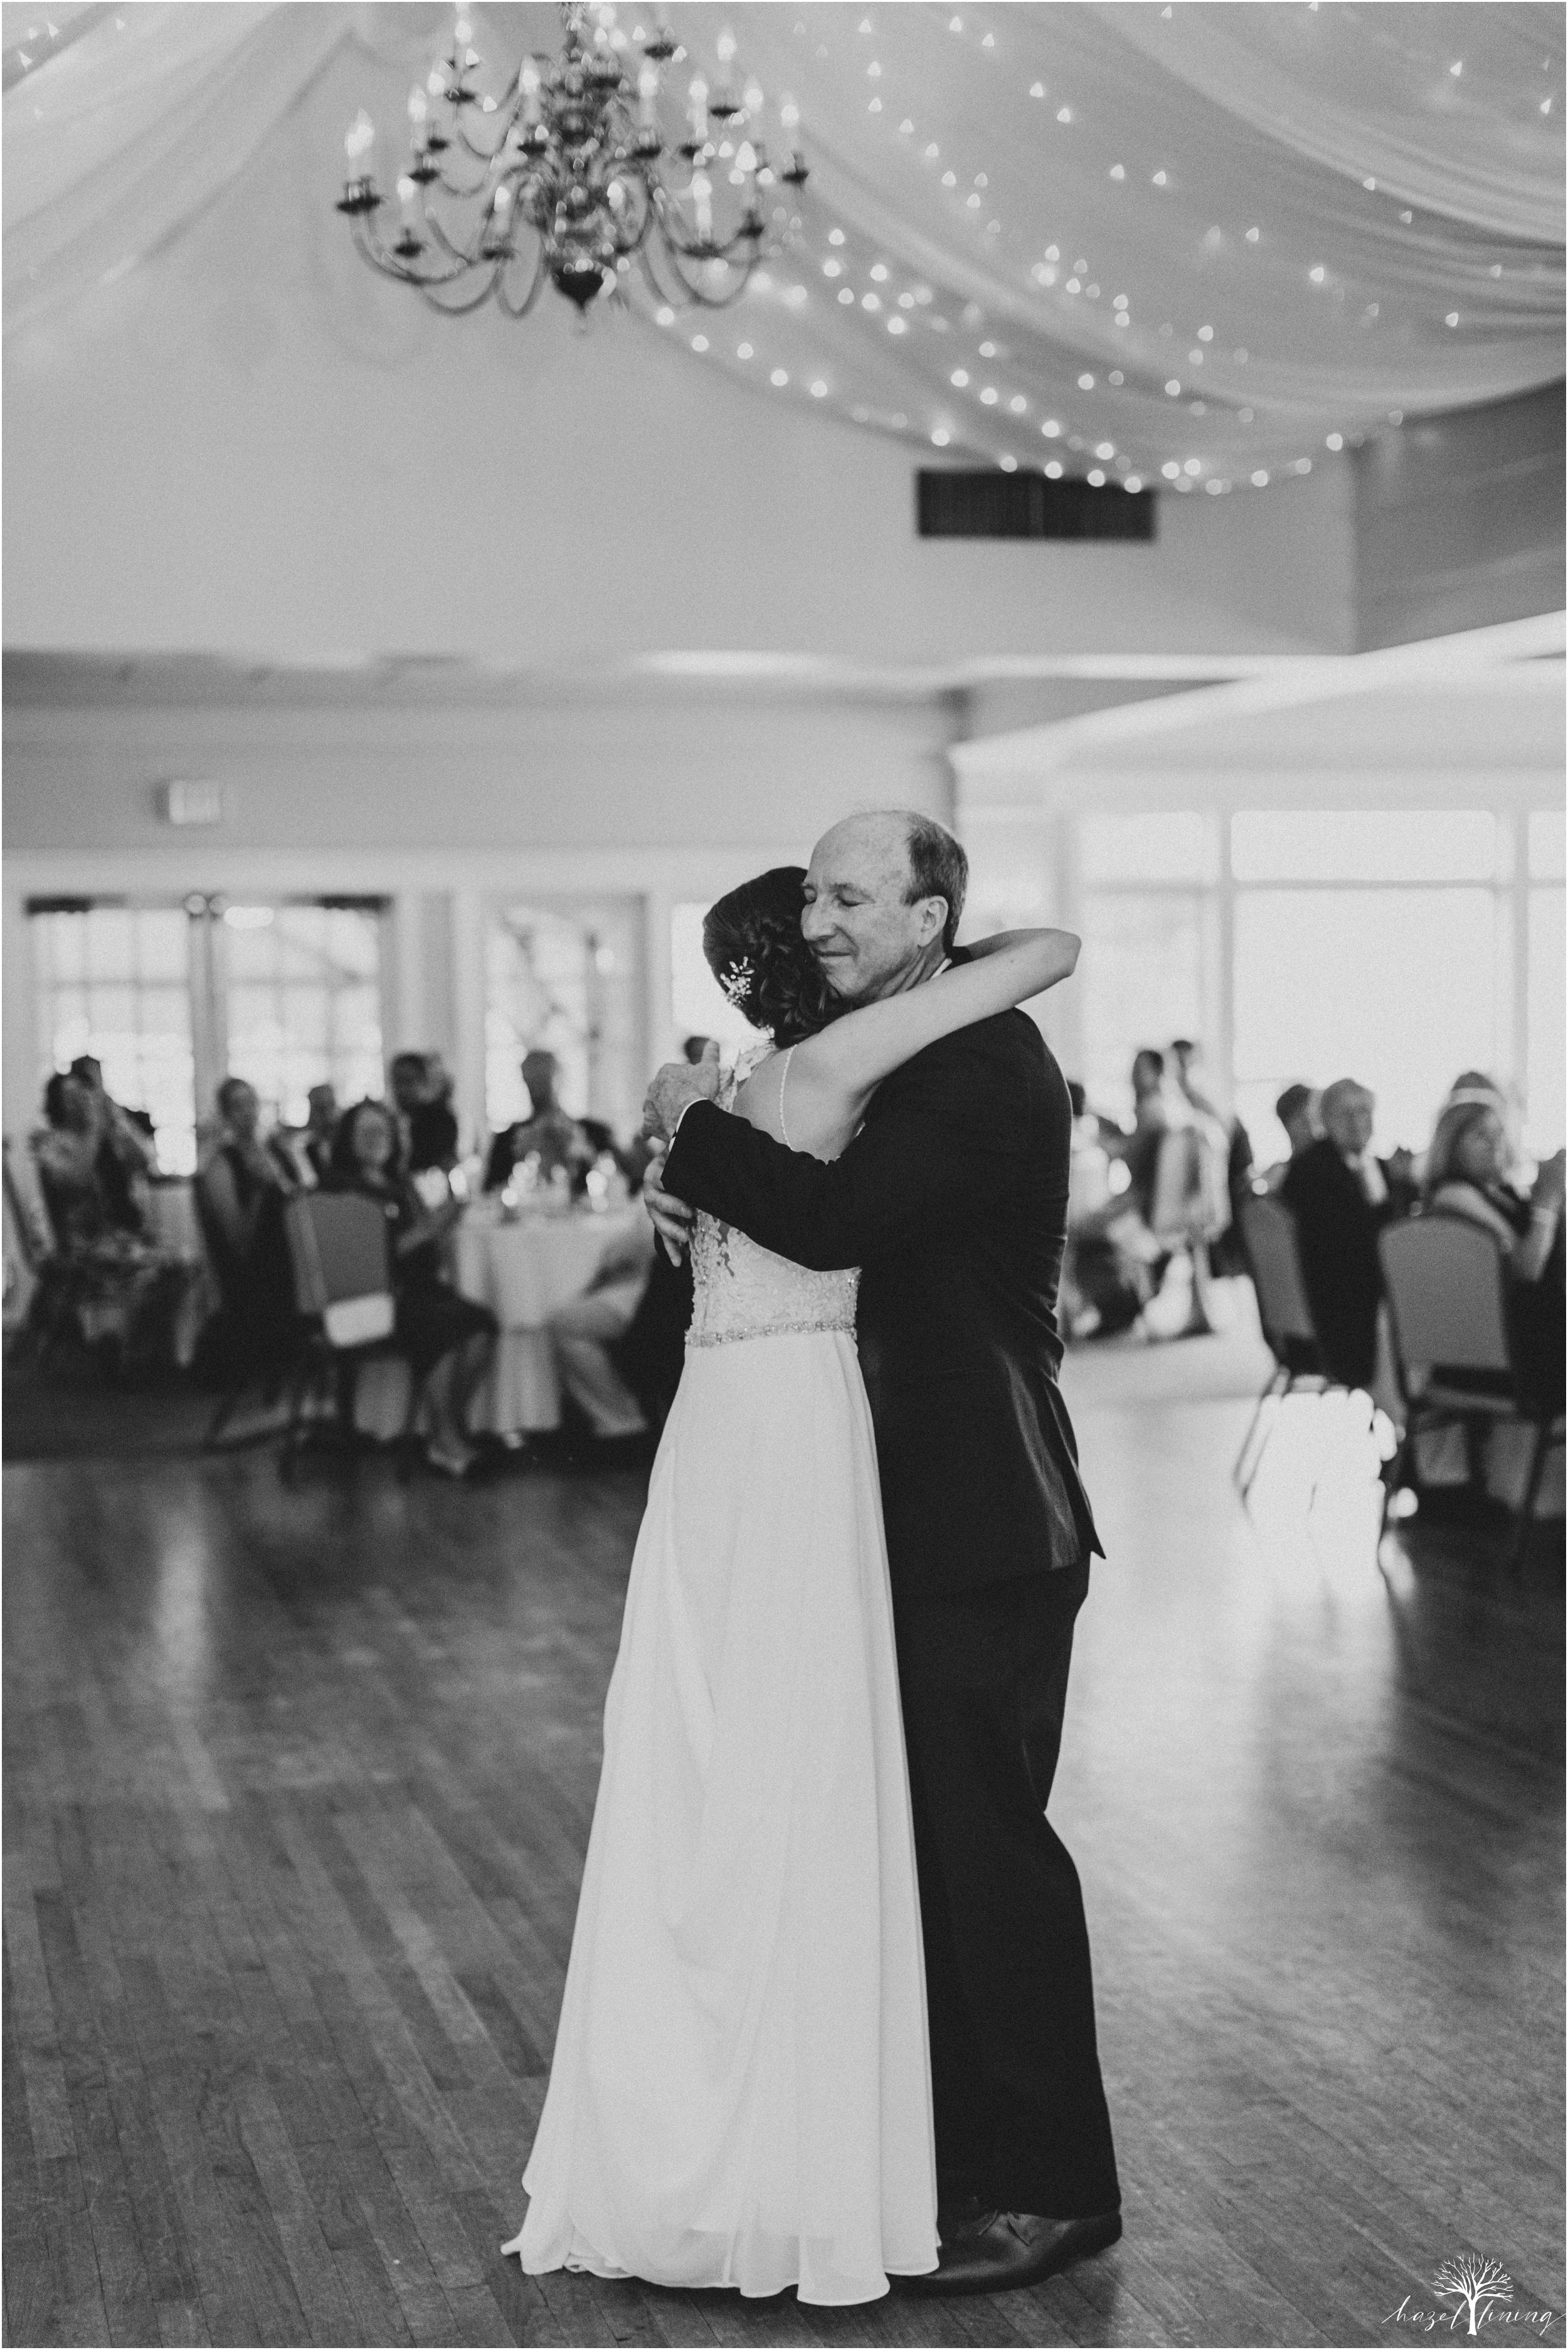 hazel-lining-travel-wedding-elopement-photography_0139.jpg